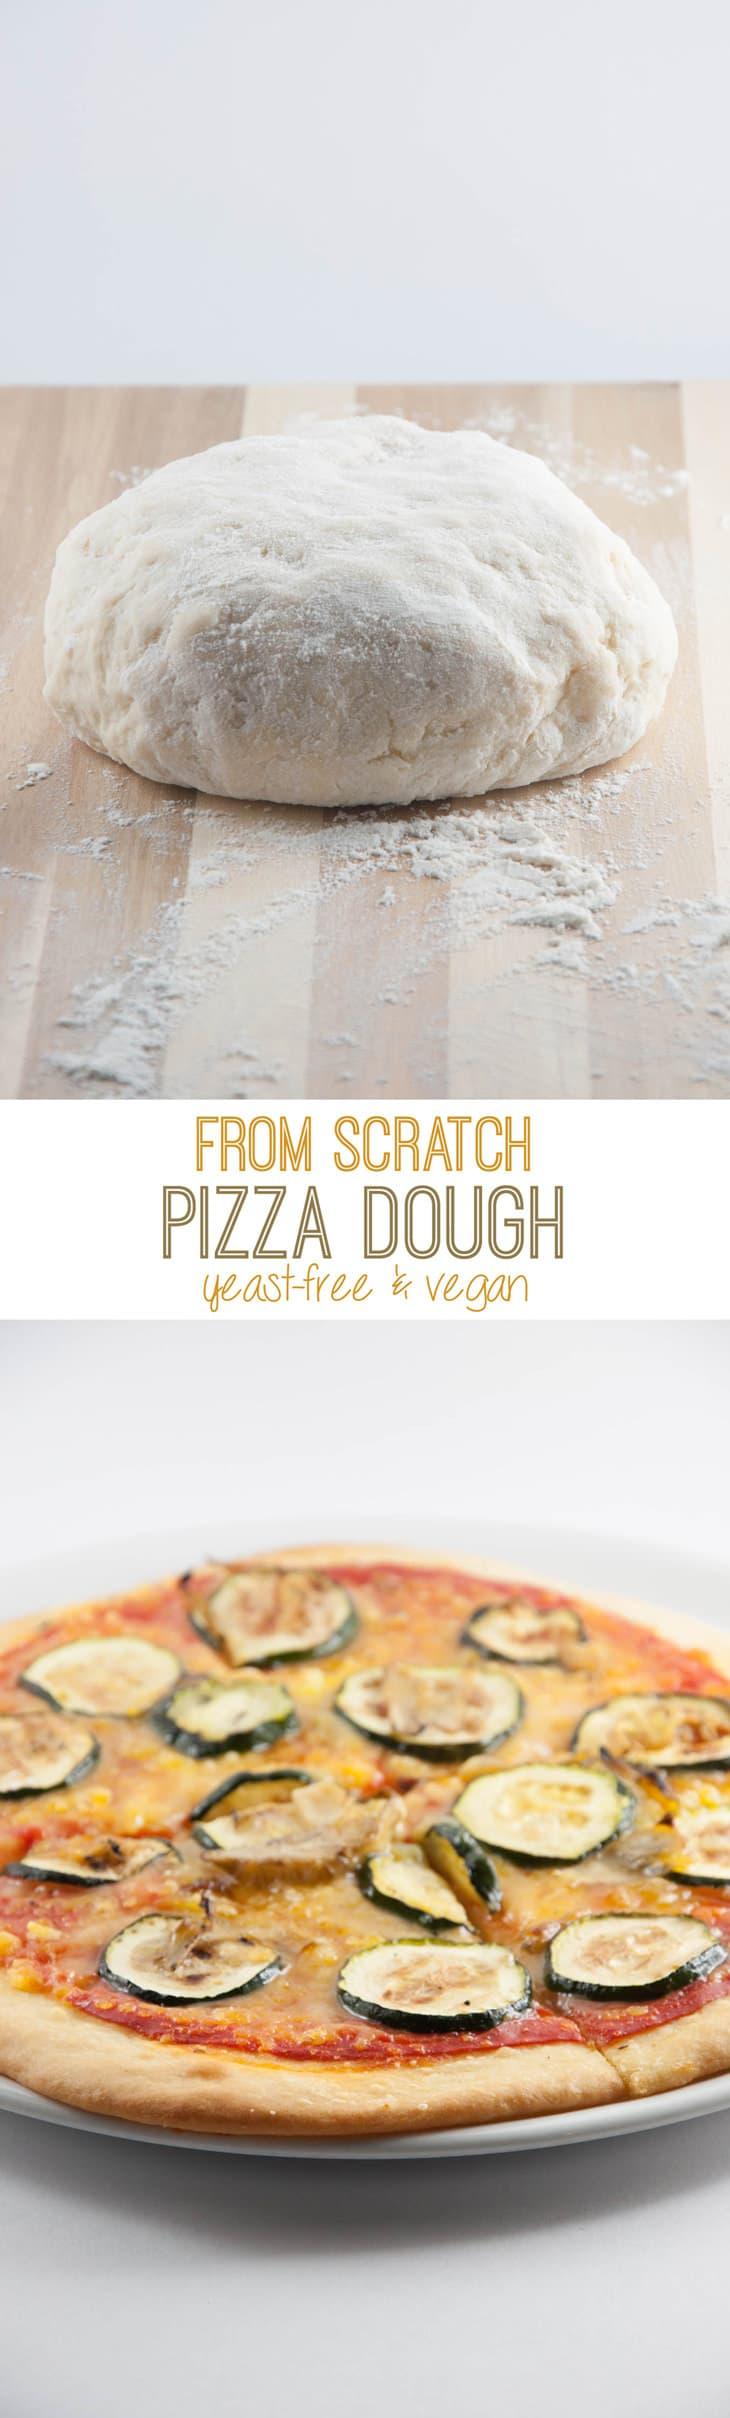 Yeast-Free Vegan Pizza Dough | ElephantasticVegan.com